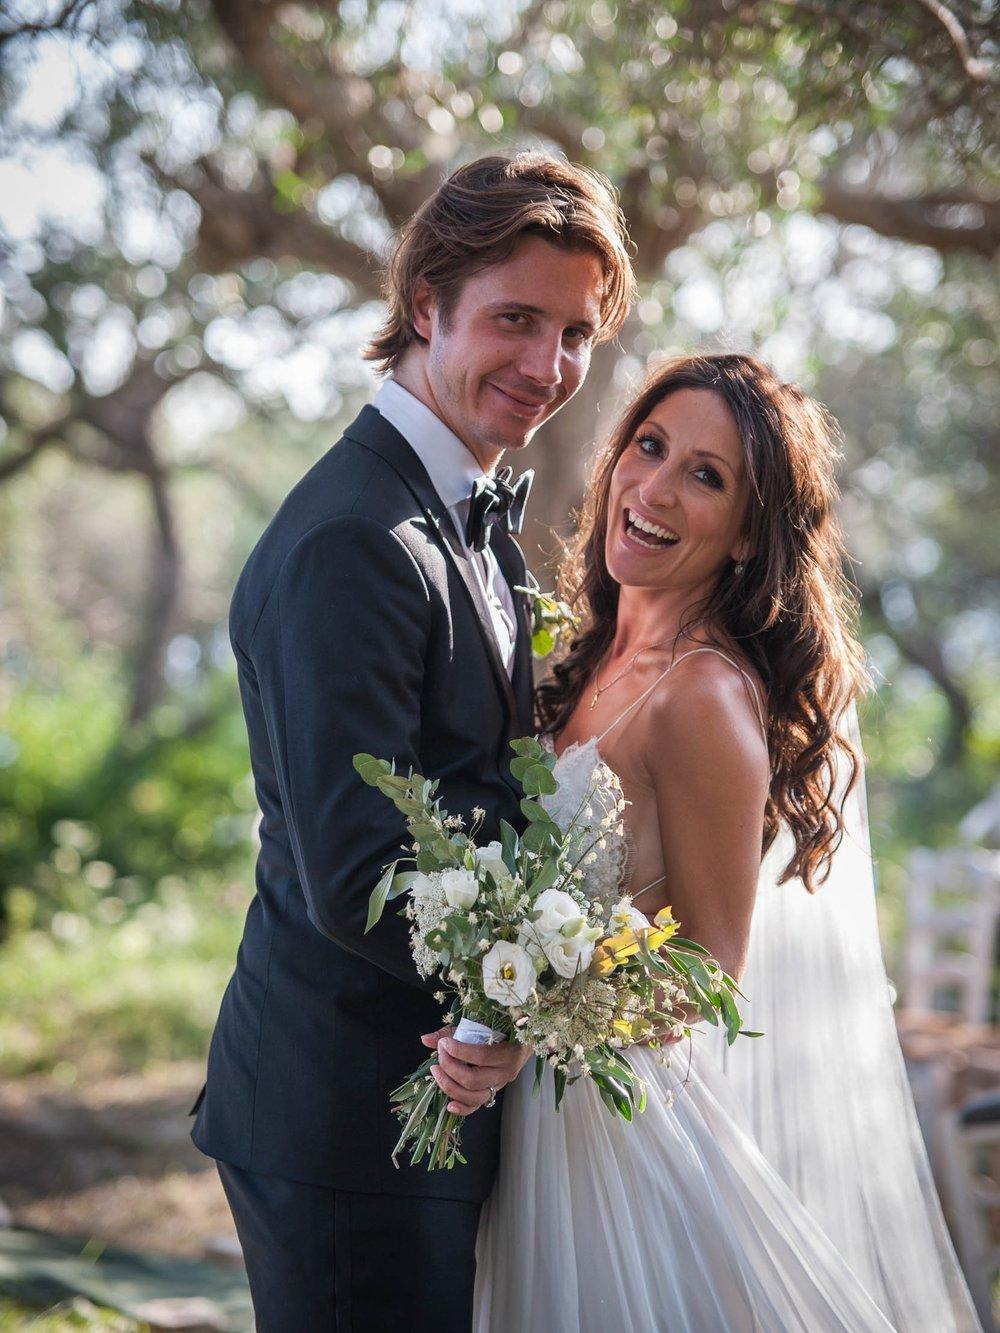 NATASHA & TIM - Πανέμορφος γάμος στους Παξούς